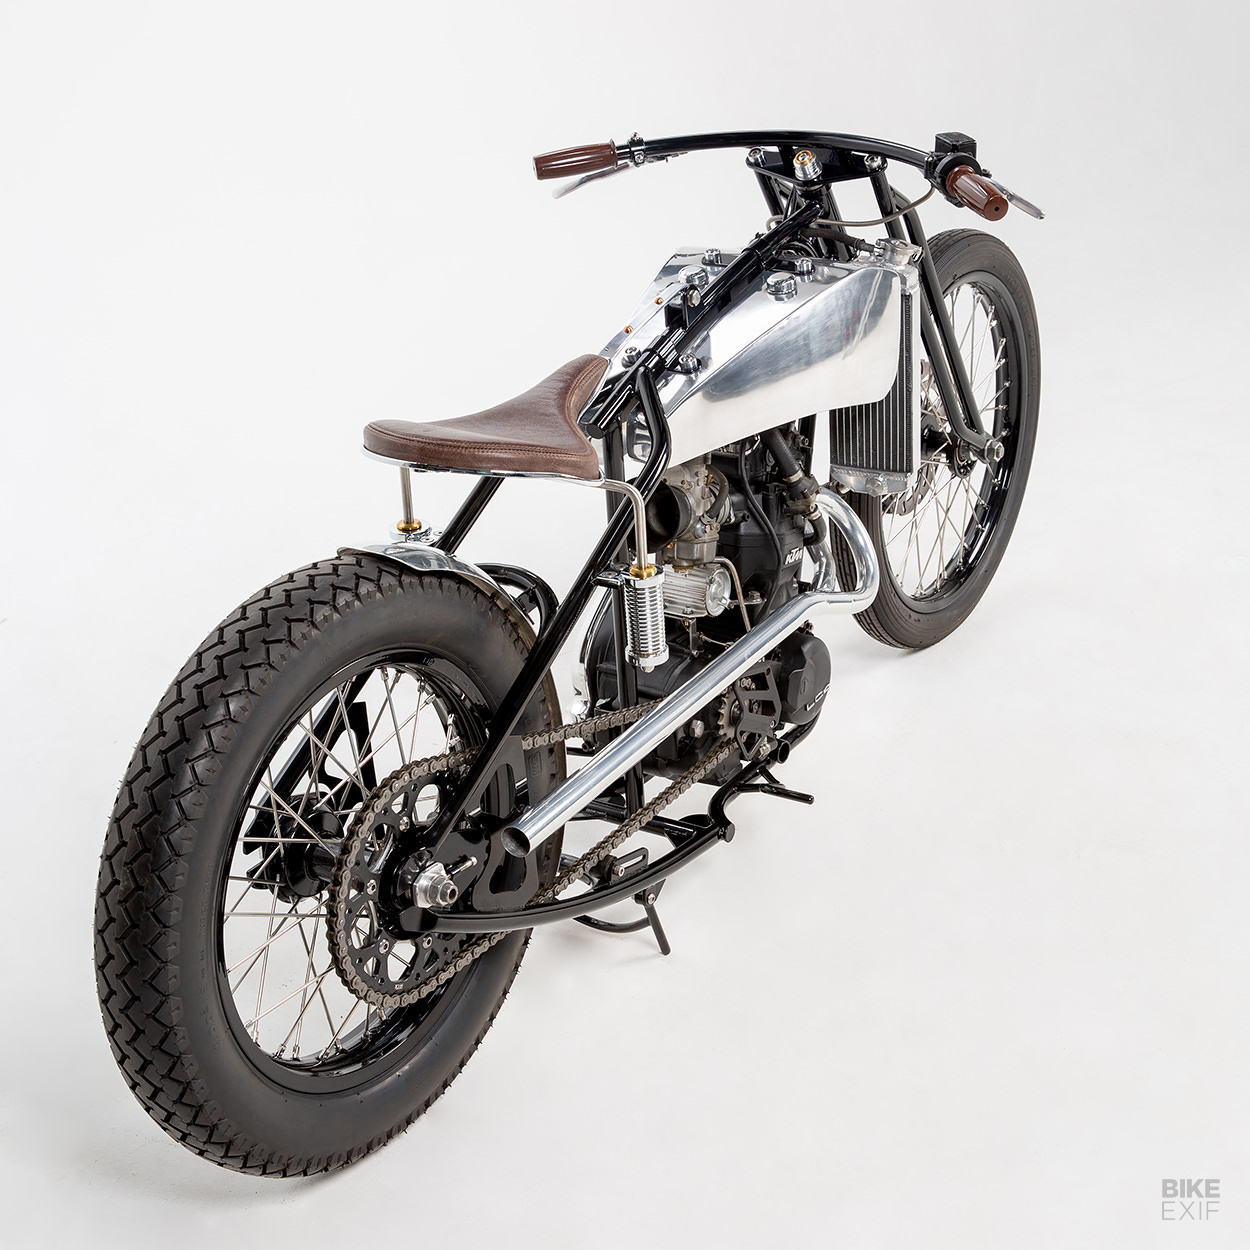 Custom KTM 620 Enduro bobber by Machine 1867